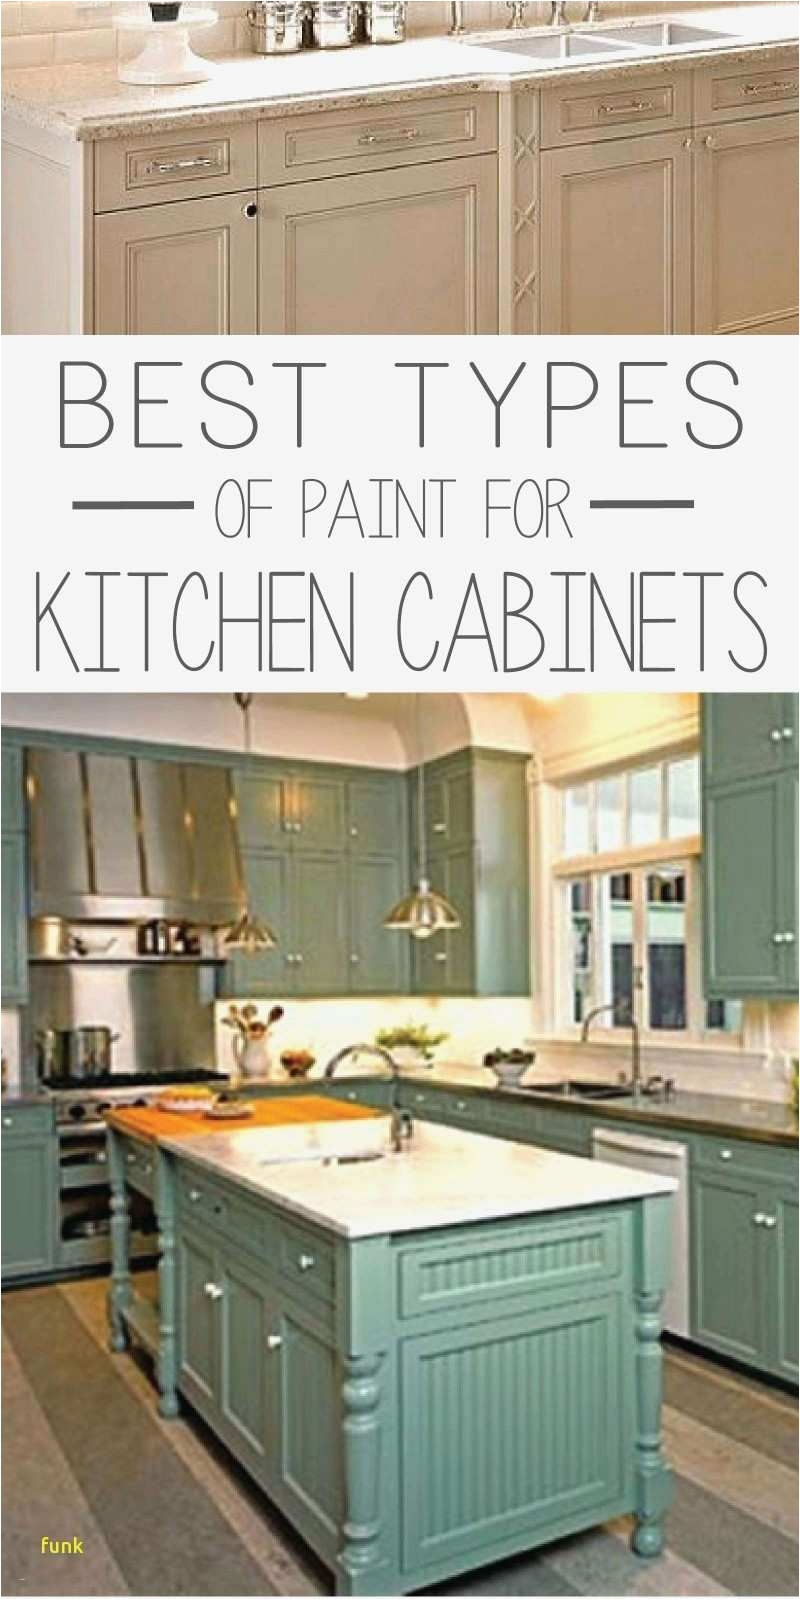 Dream Maker Kitchens and Baths Inspirational Small Kitchenette Ideas Best Kitchen Ideas Bathroom Elegant Ideas 0d